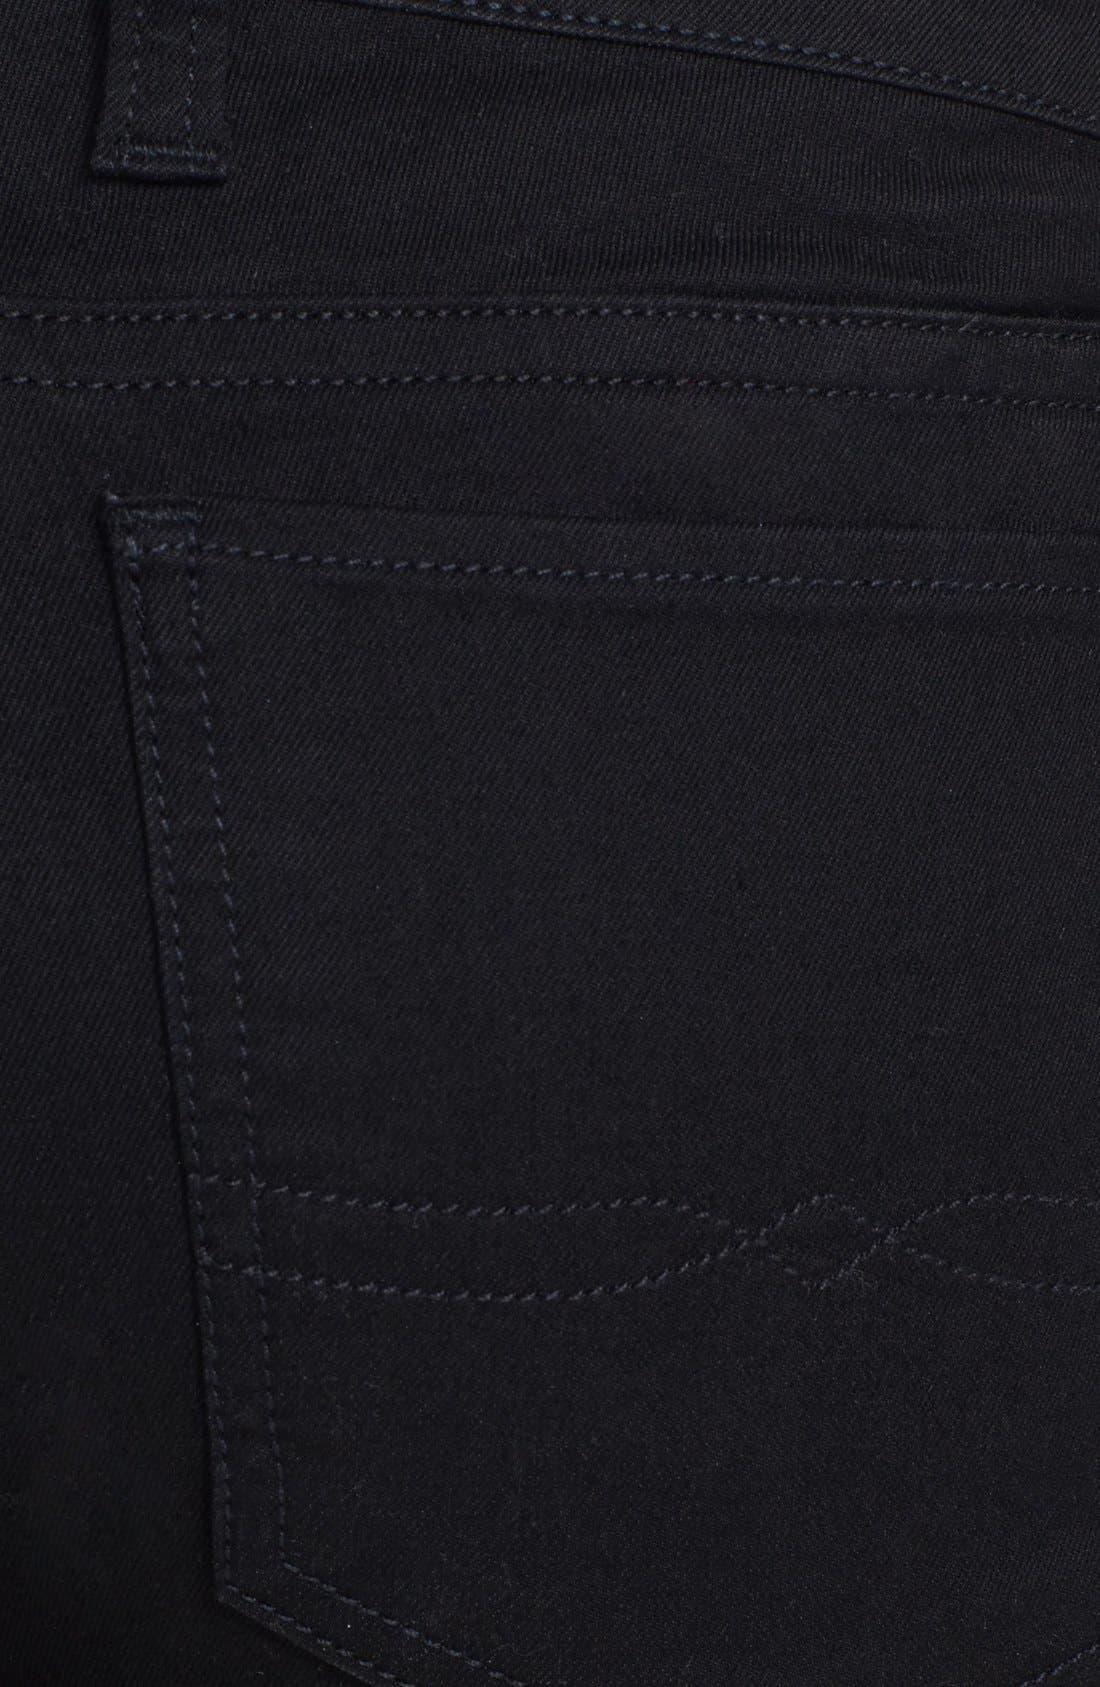 Alternate Image 2  - Lucky Brand 'Charlie - Moto' Super Skinny Jeans